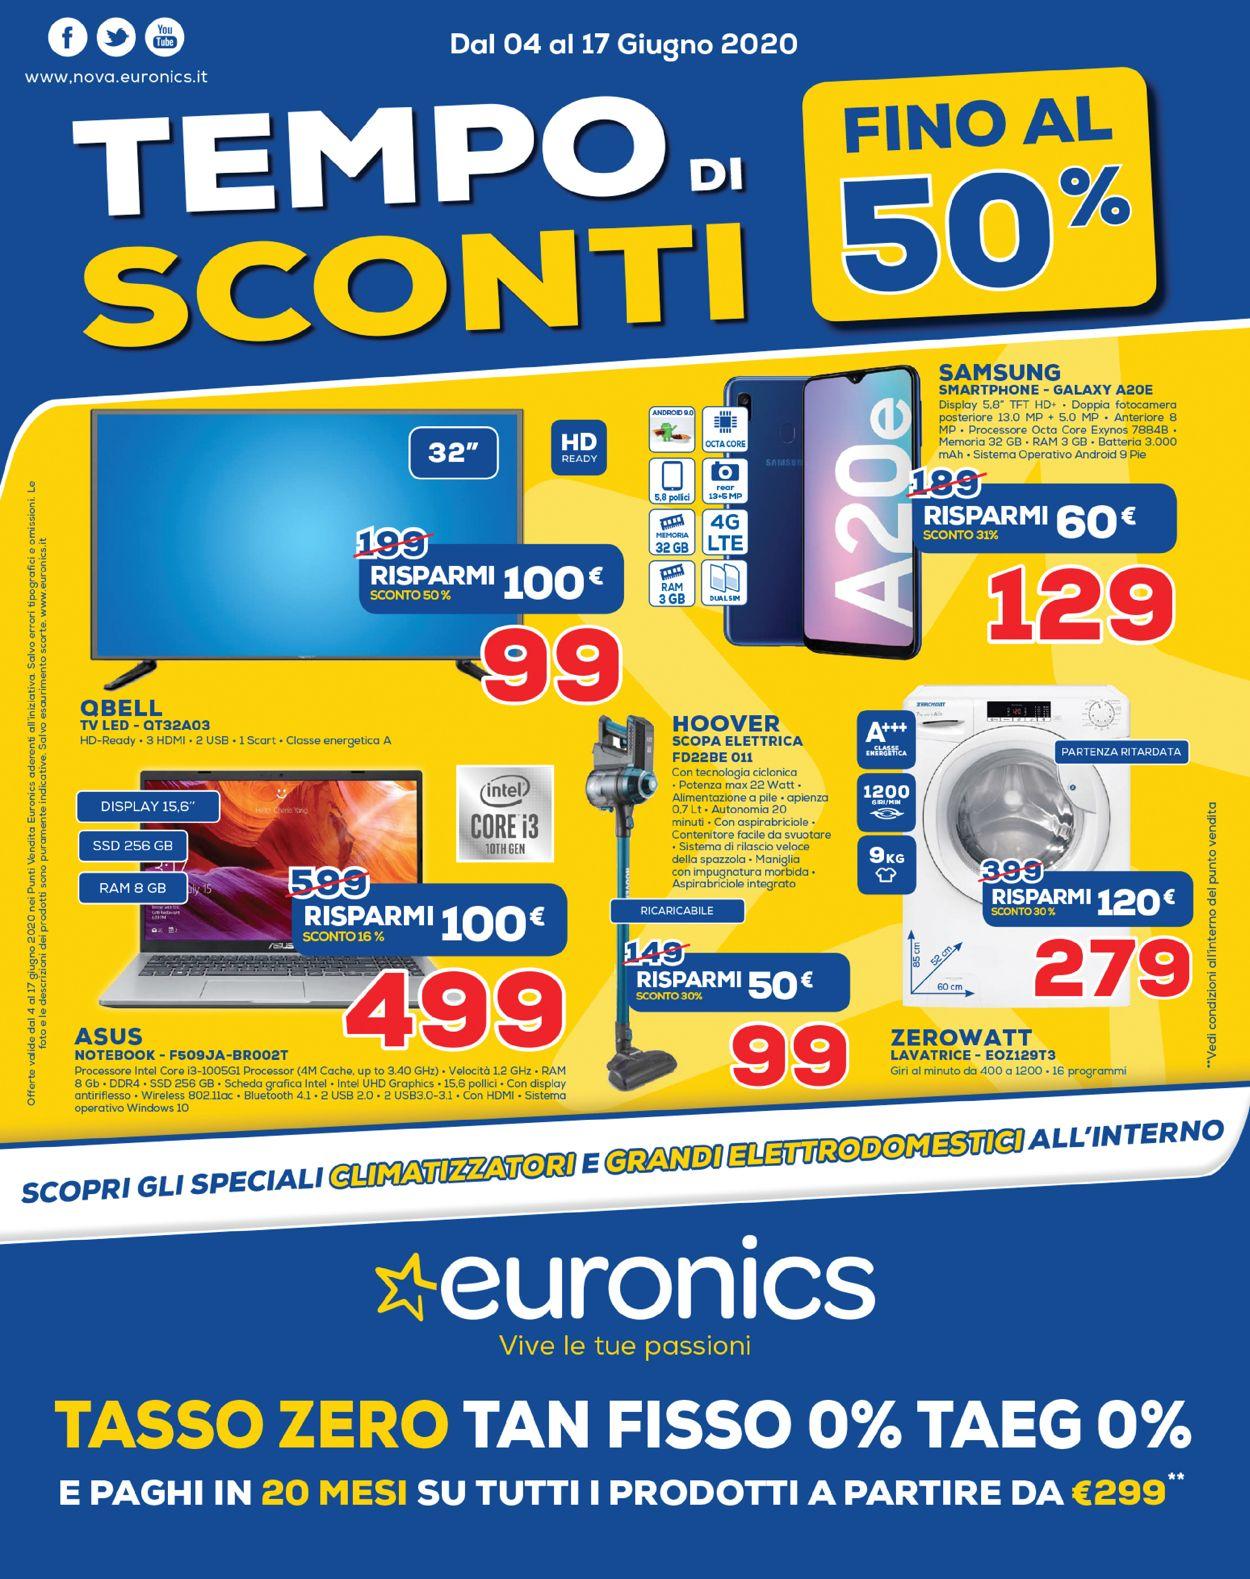 Volantino Euronics - Offerte 04/06-17/06/2020